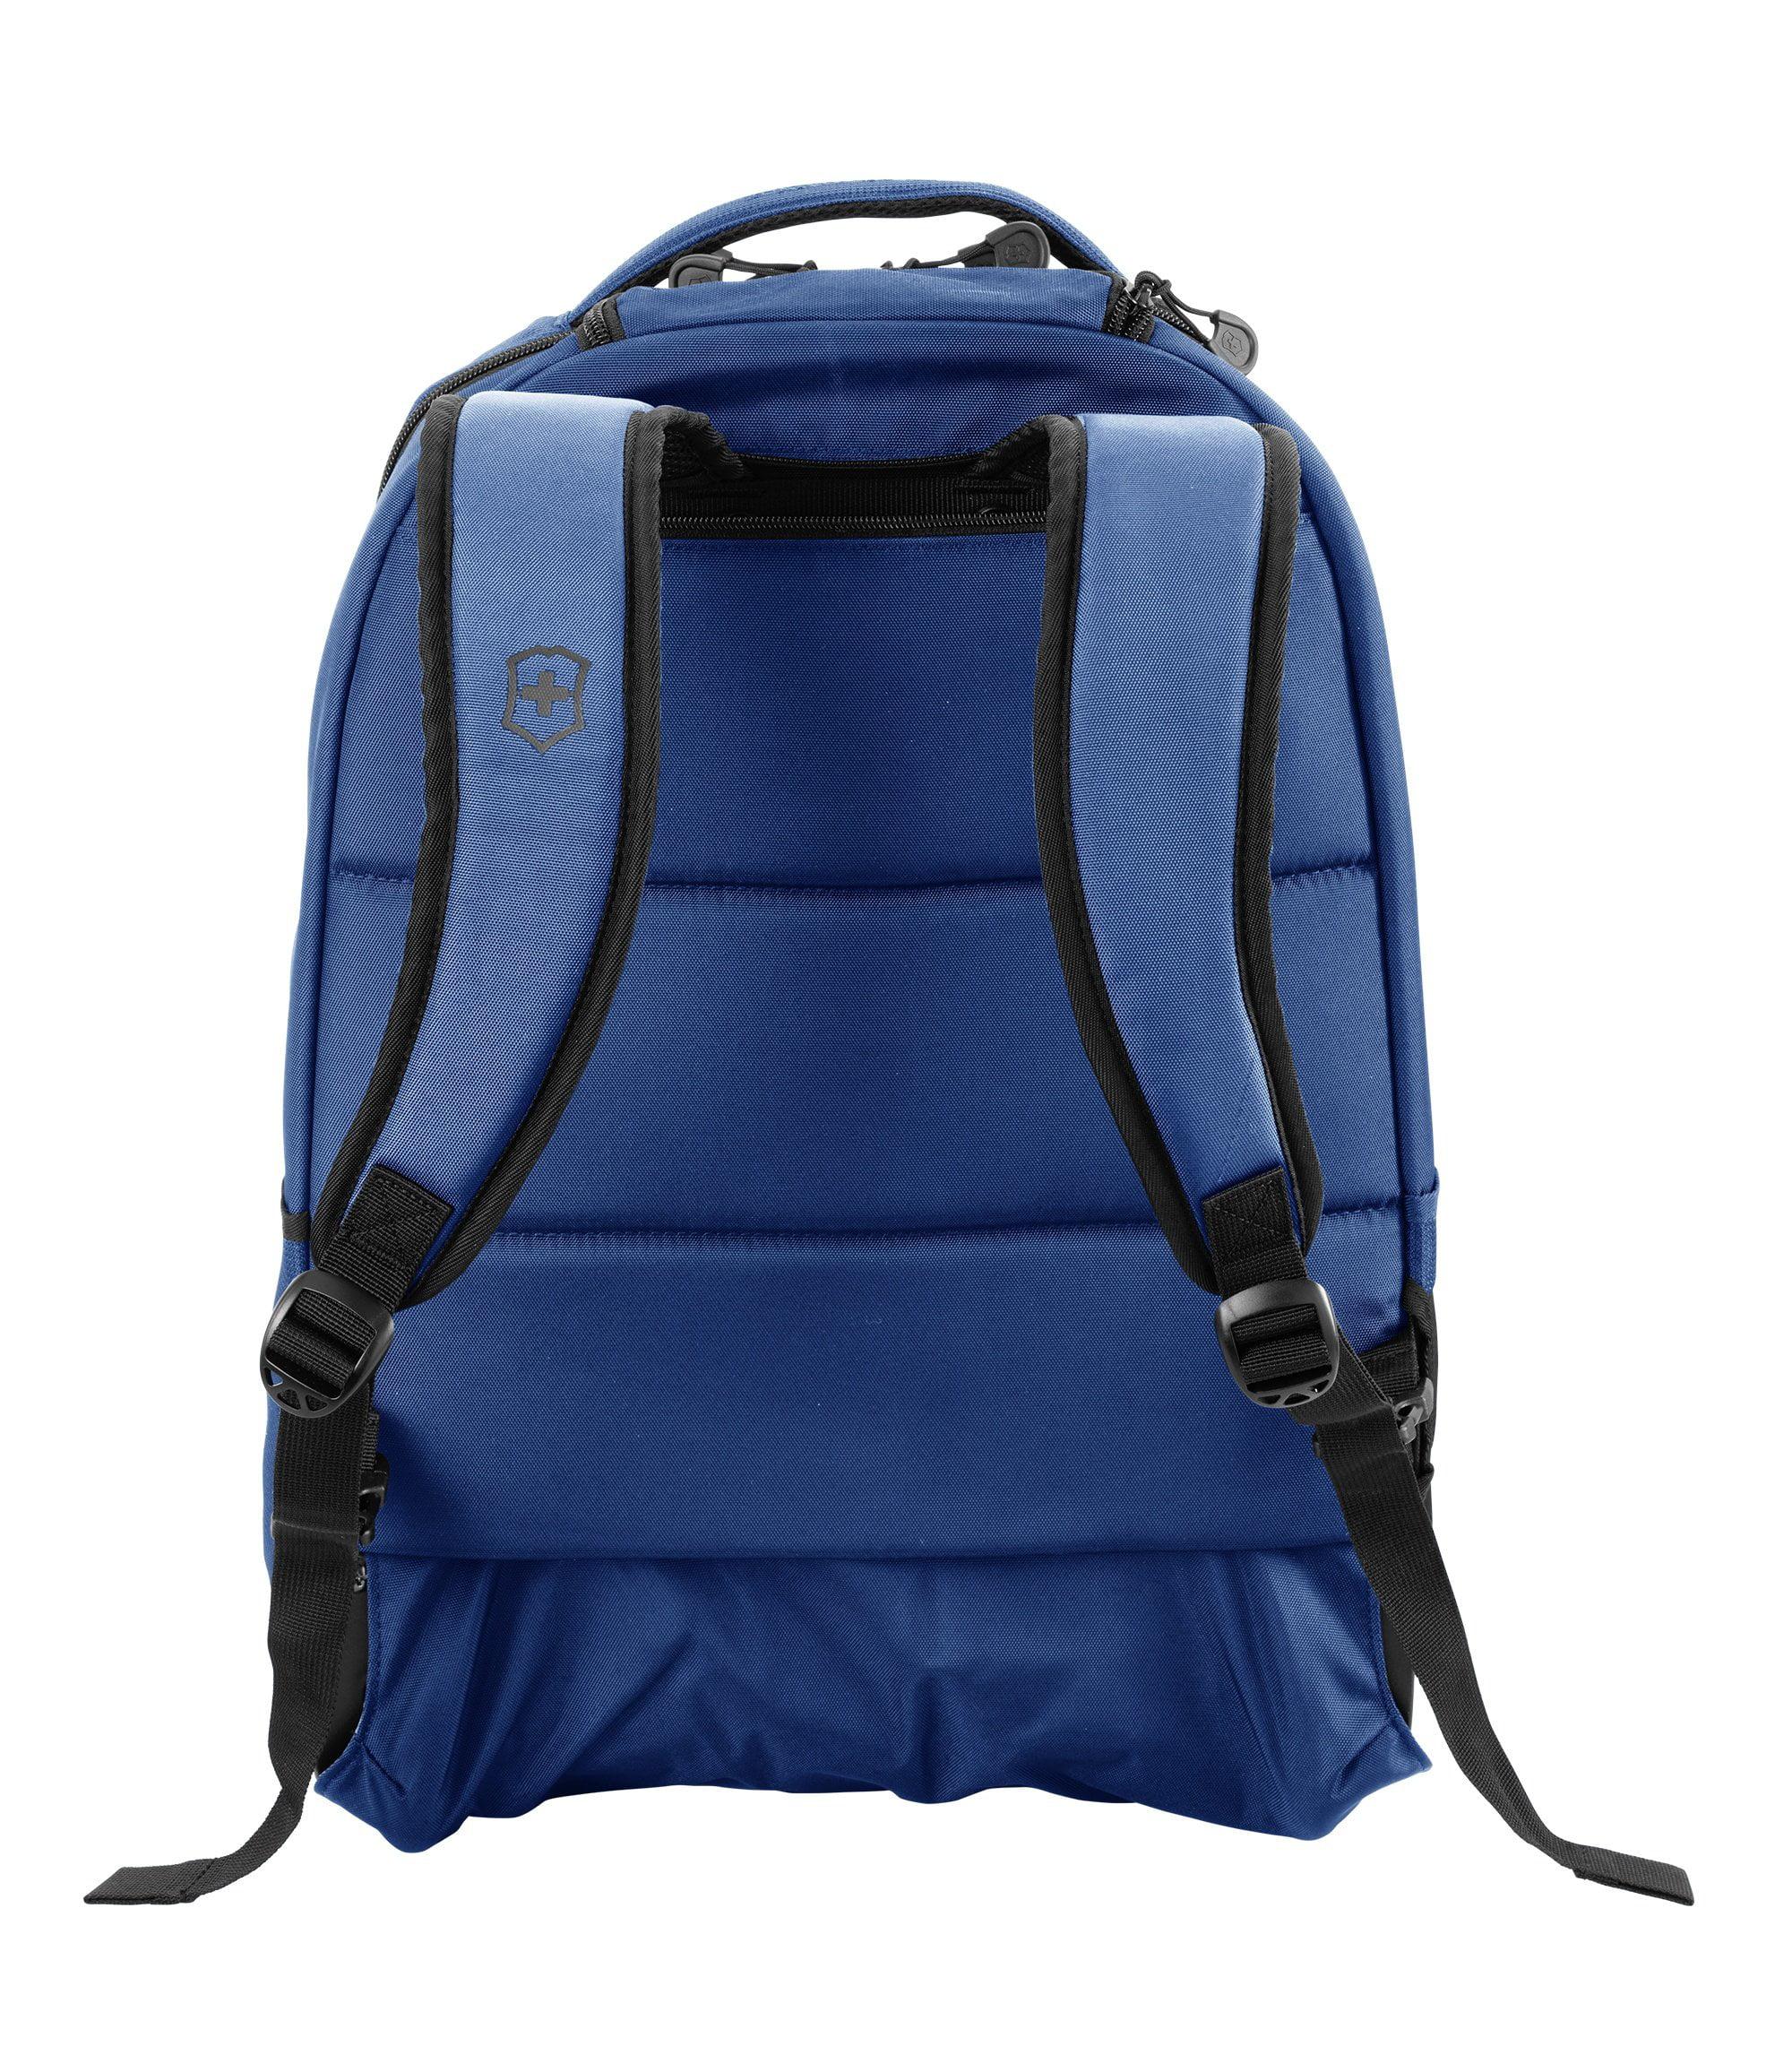 Ssxvjaioervrf Sonic Tokyo 2020 Unstoppable Unisex School Backpack Sports Traveling Daypack Blue